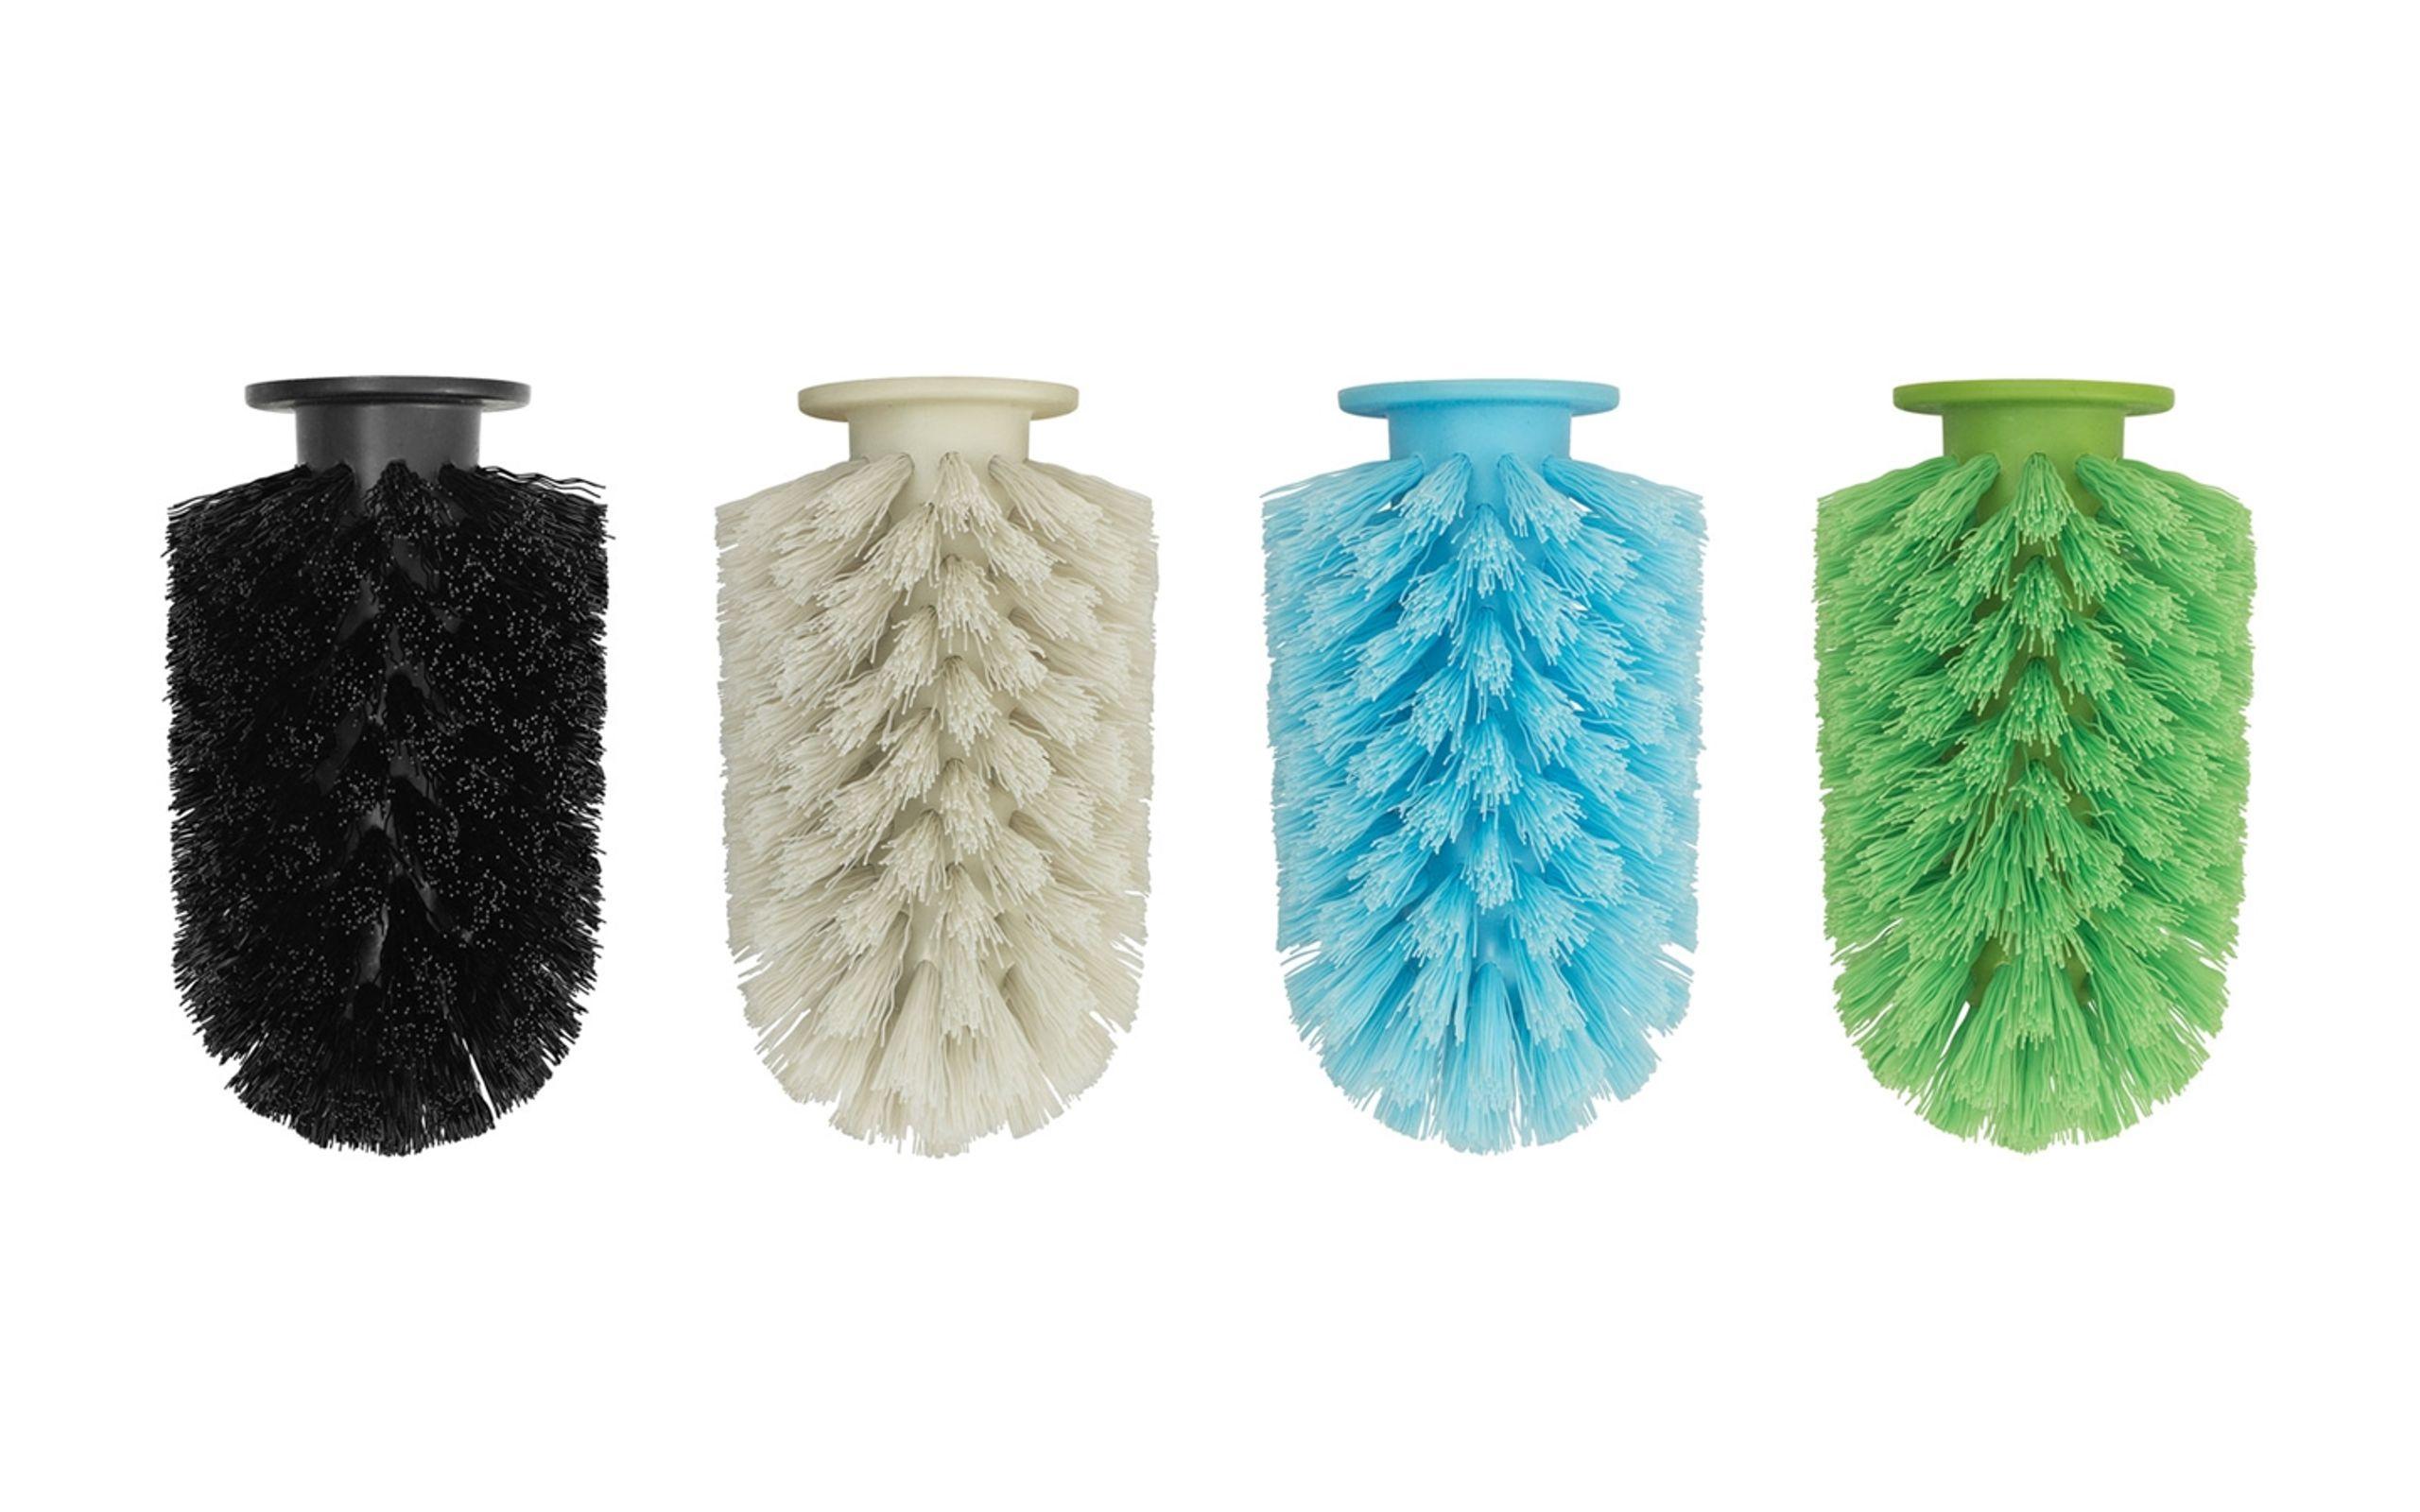 Toilet Brush Head : Ballo toilet brush normann copenhagen